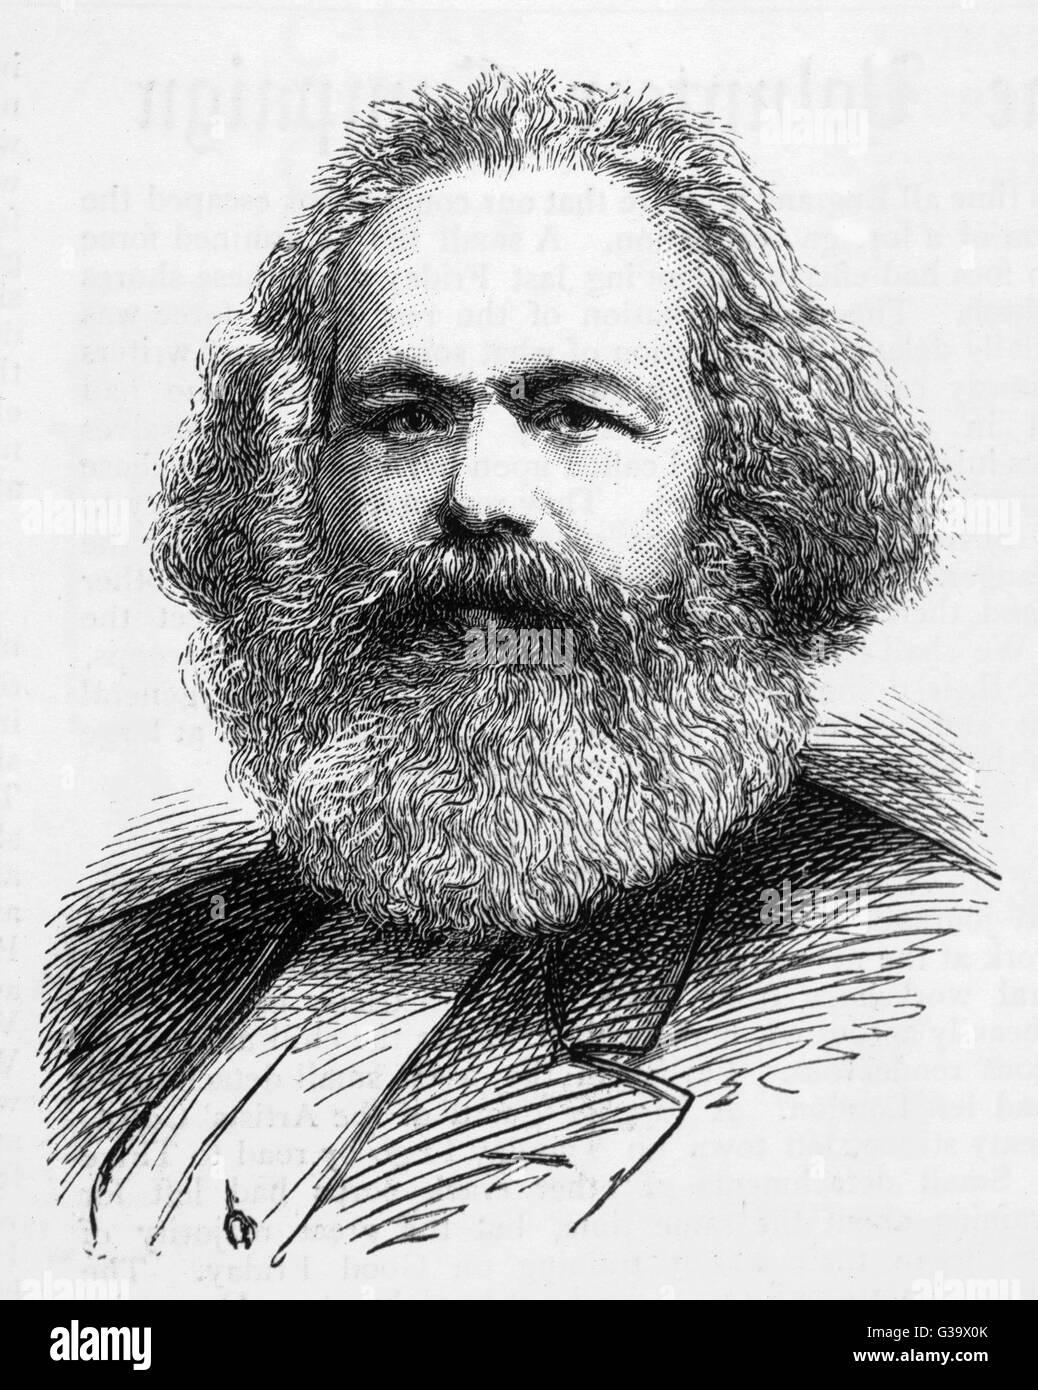 KARL MARX  German radical political  thinker       Date: 1819 - 1883 - Stock Image